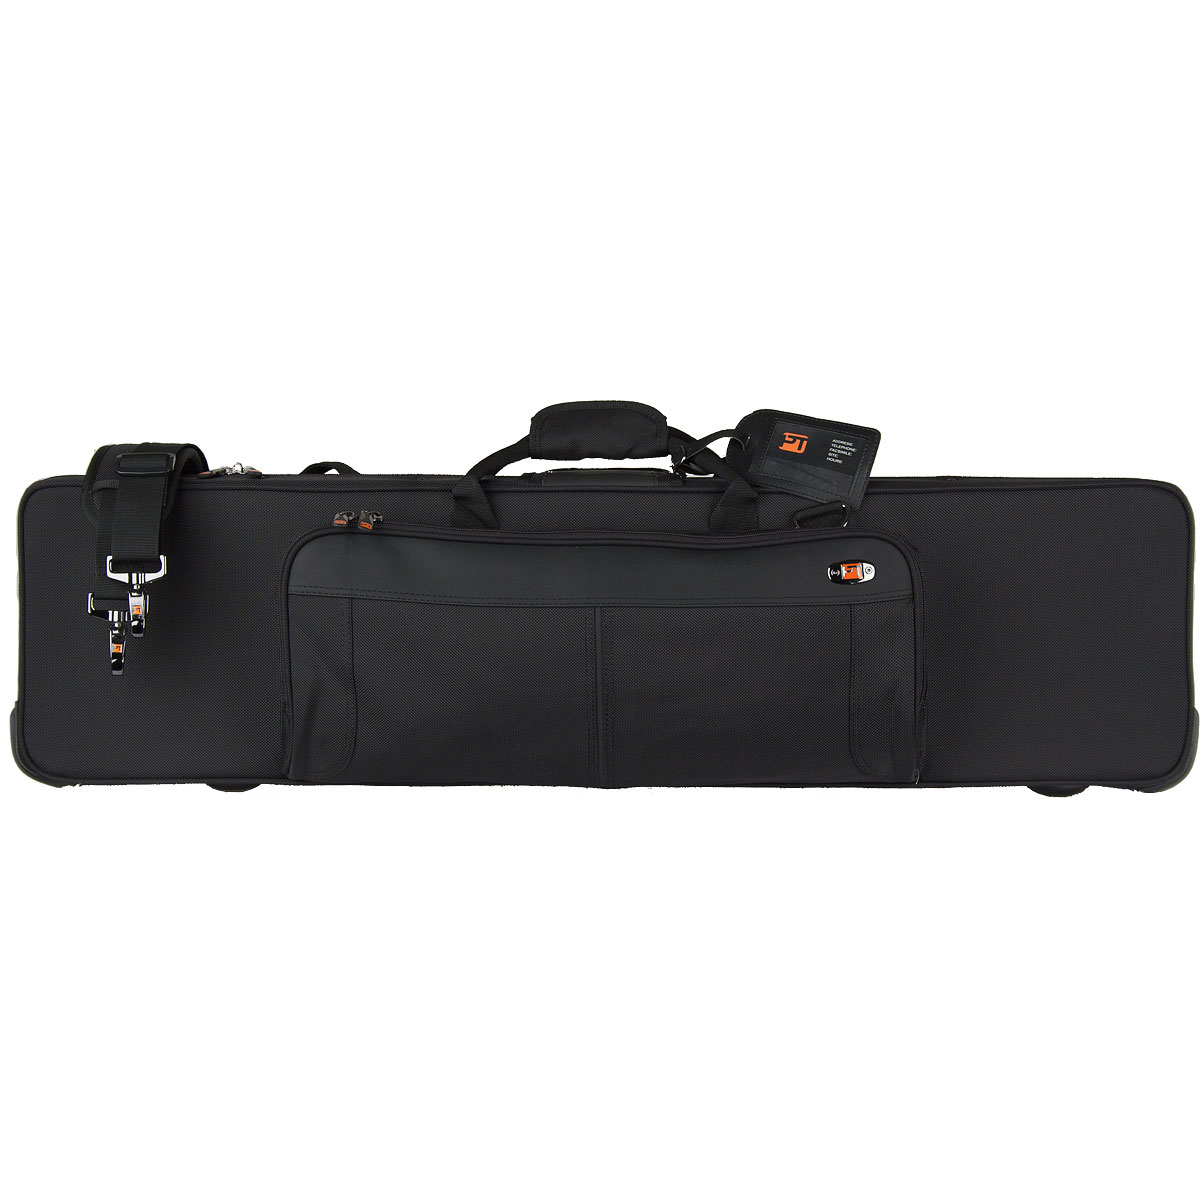 Protec Etui De Clarinette  Basse  Propac Pb-319